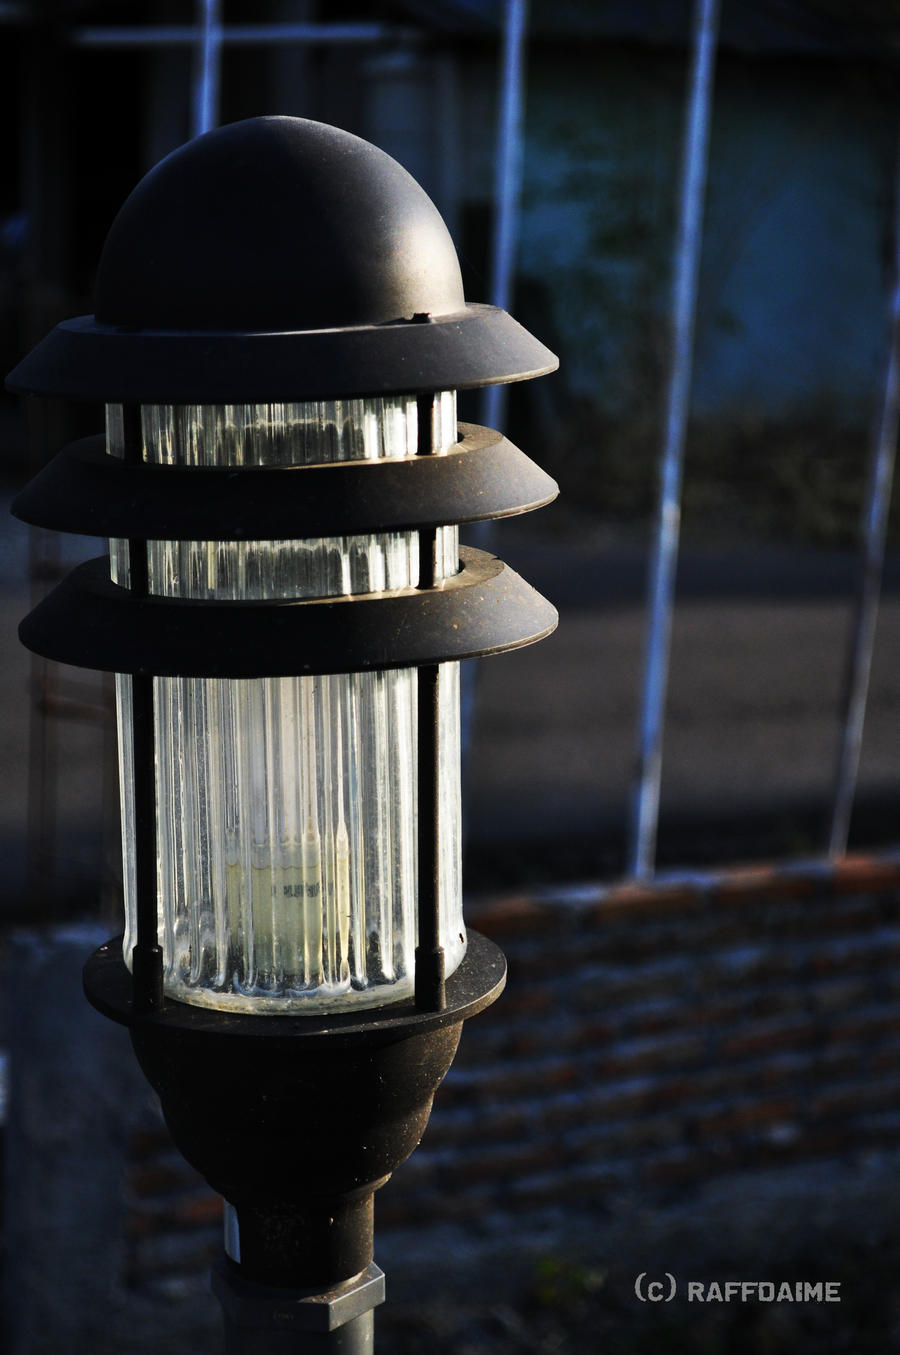 A Lamp by raffdaime